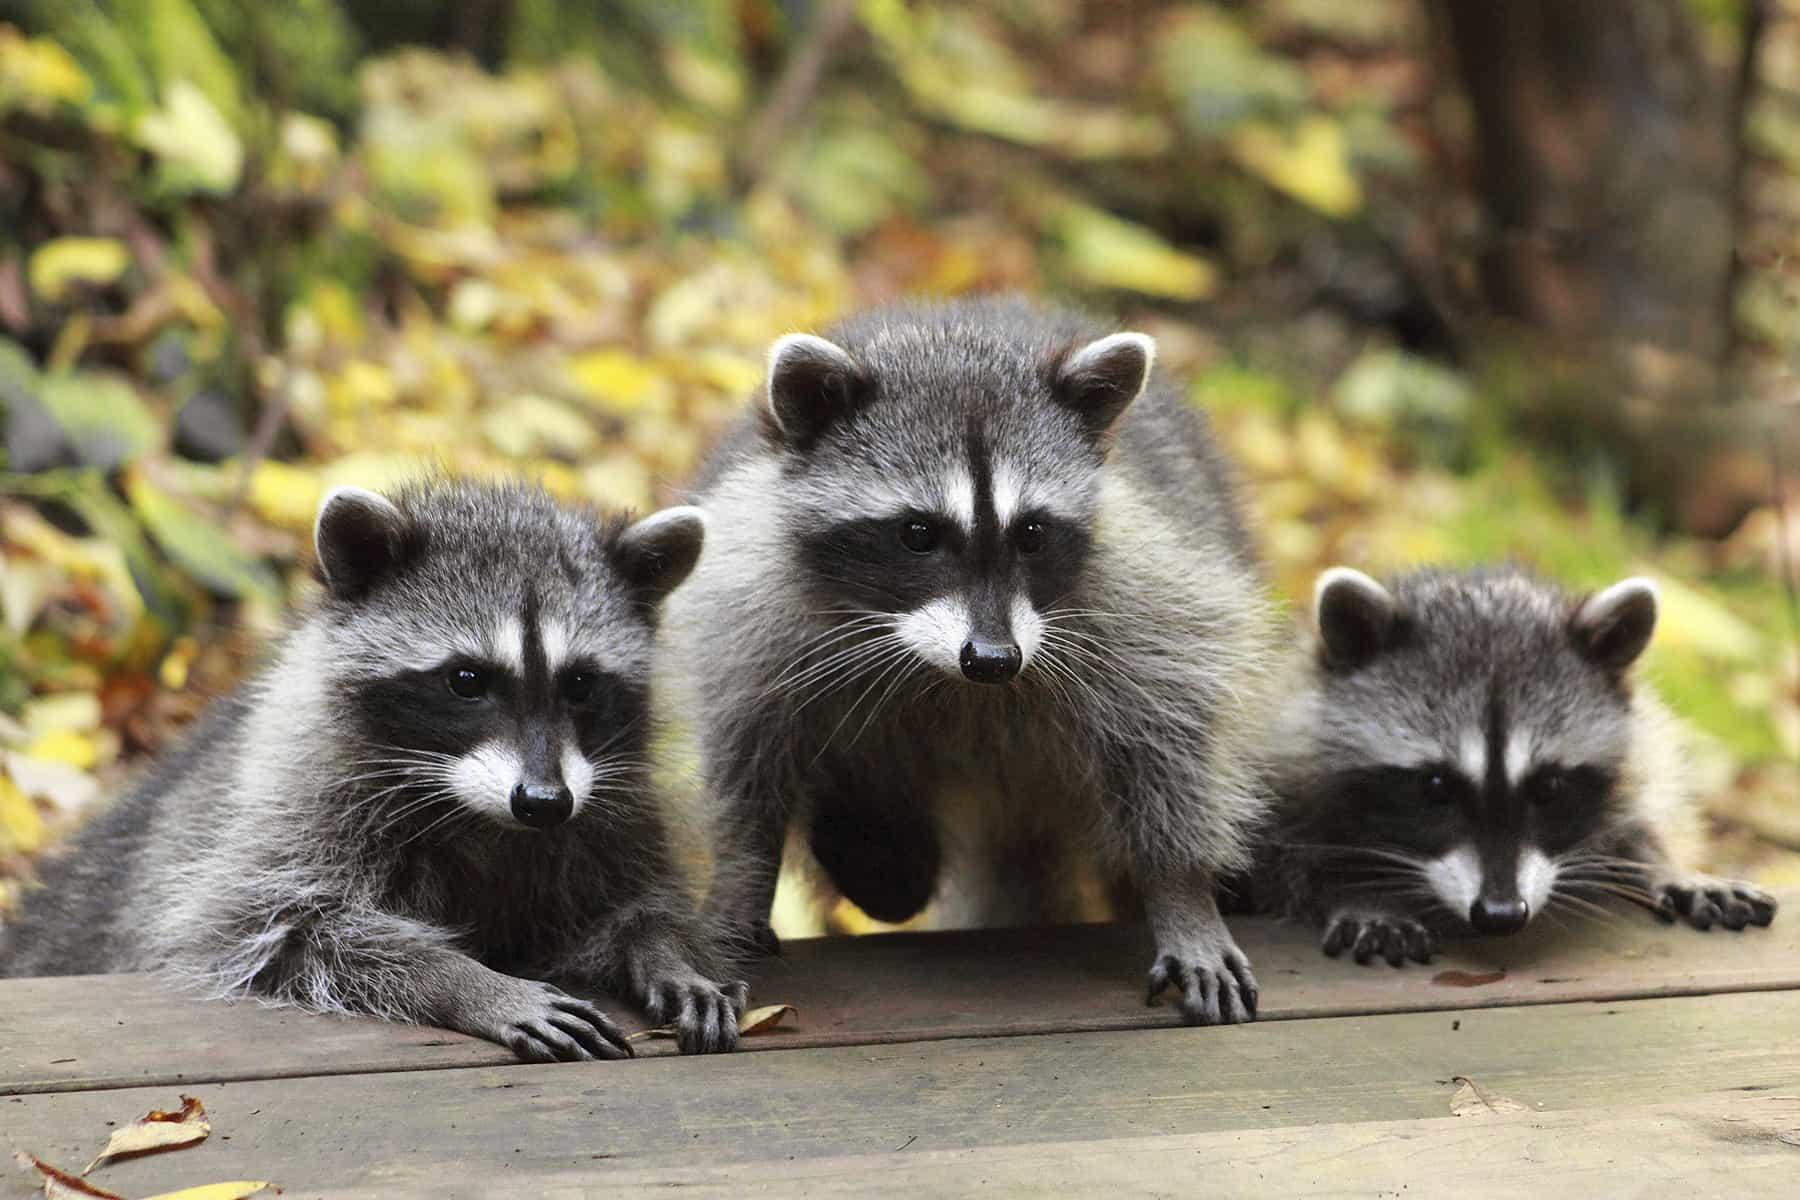 Raccoon Problem in Attic